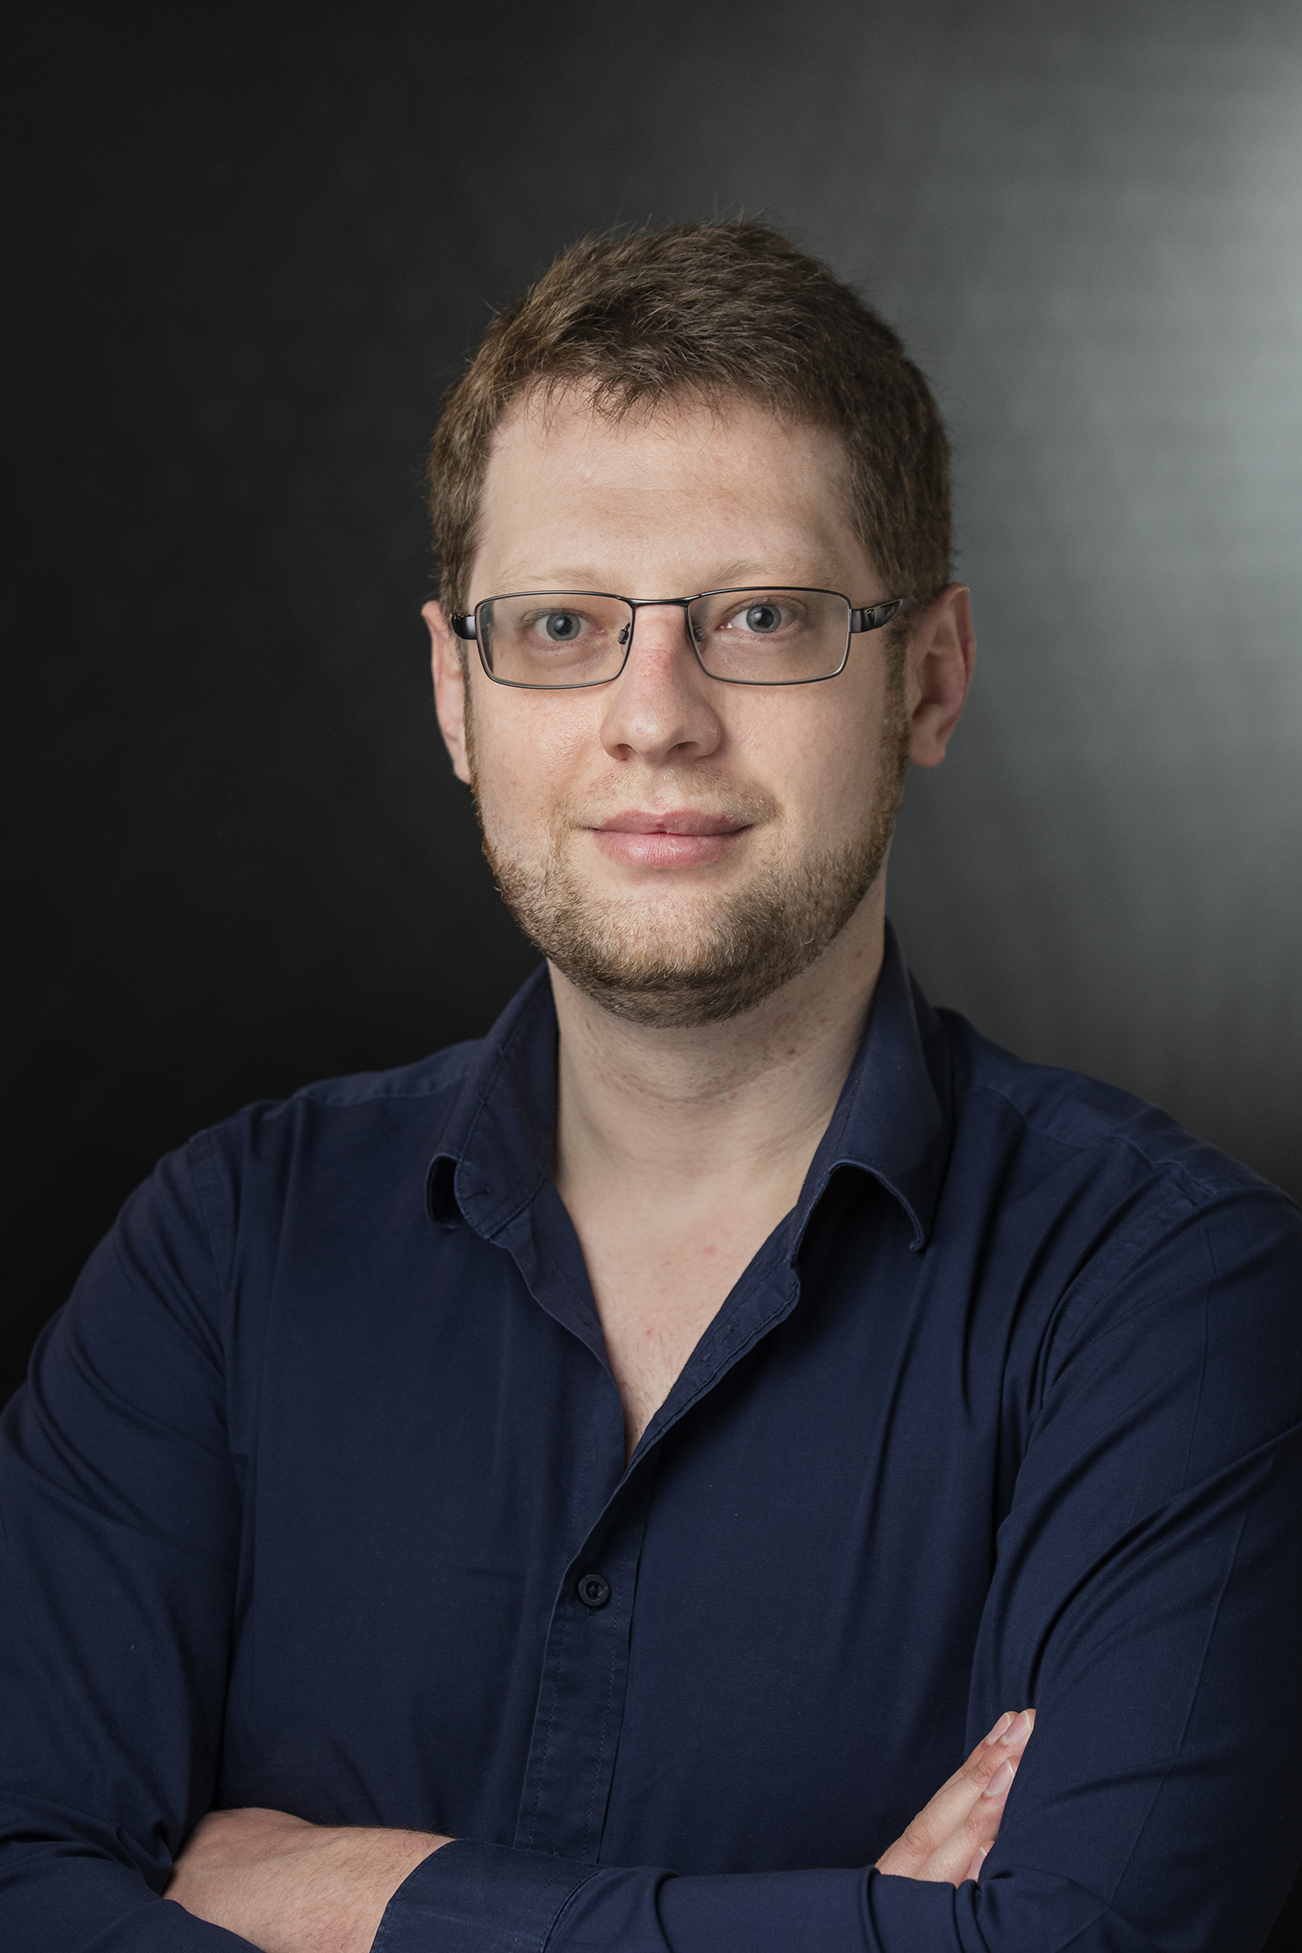 Dr Josiah Krieg